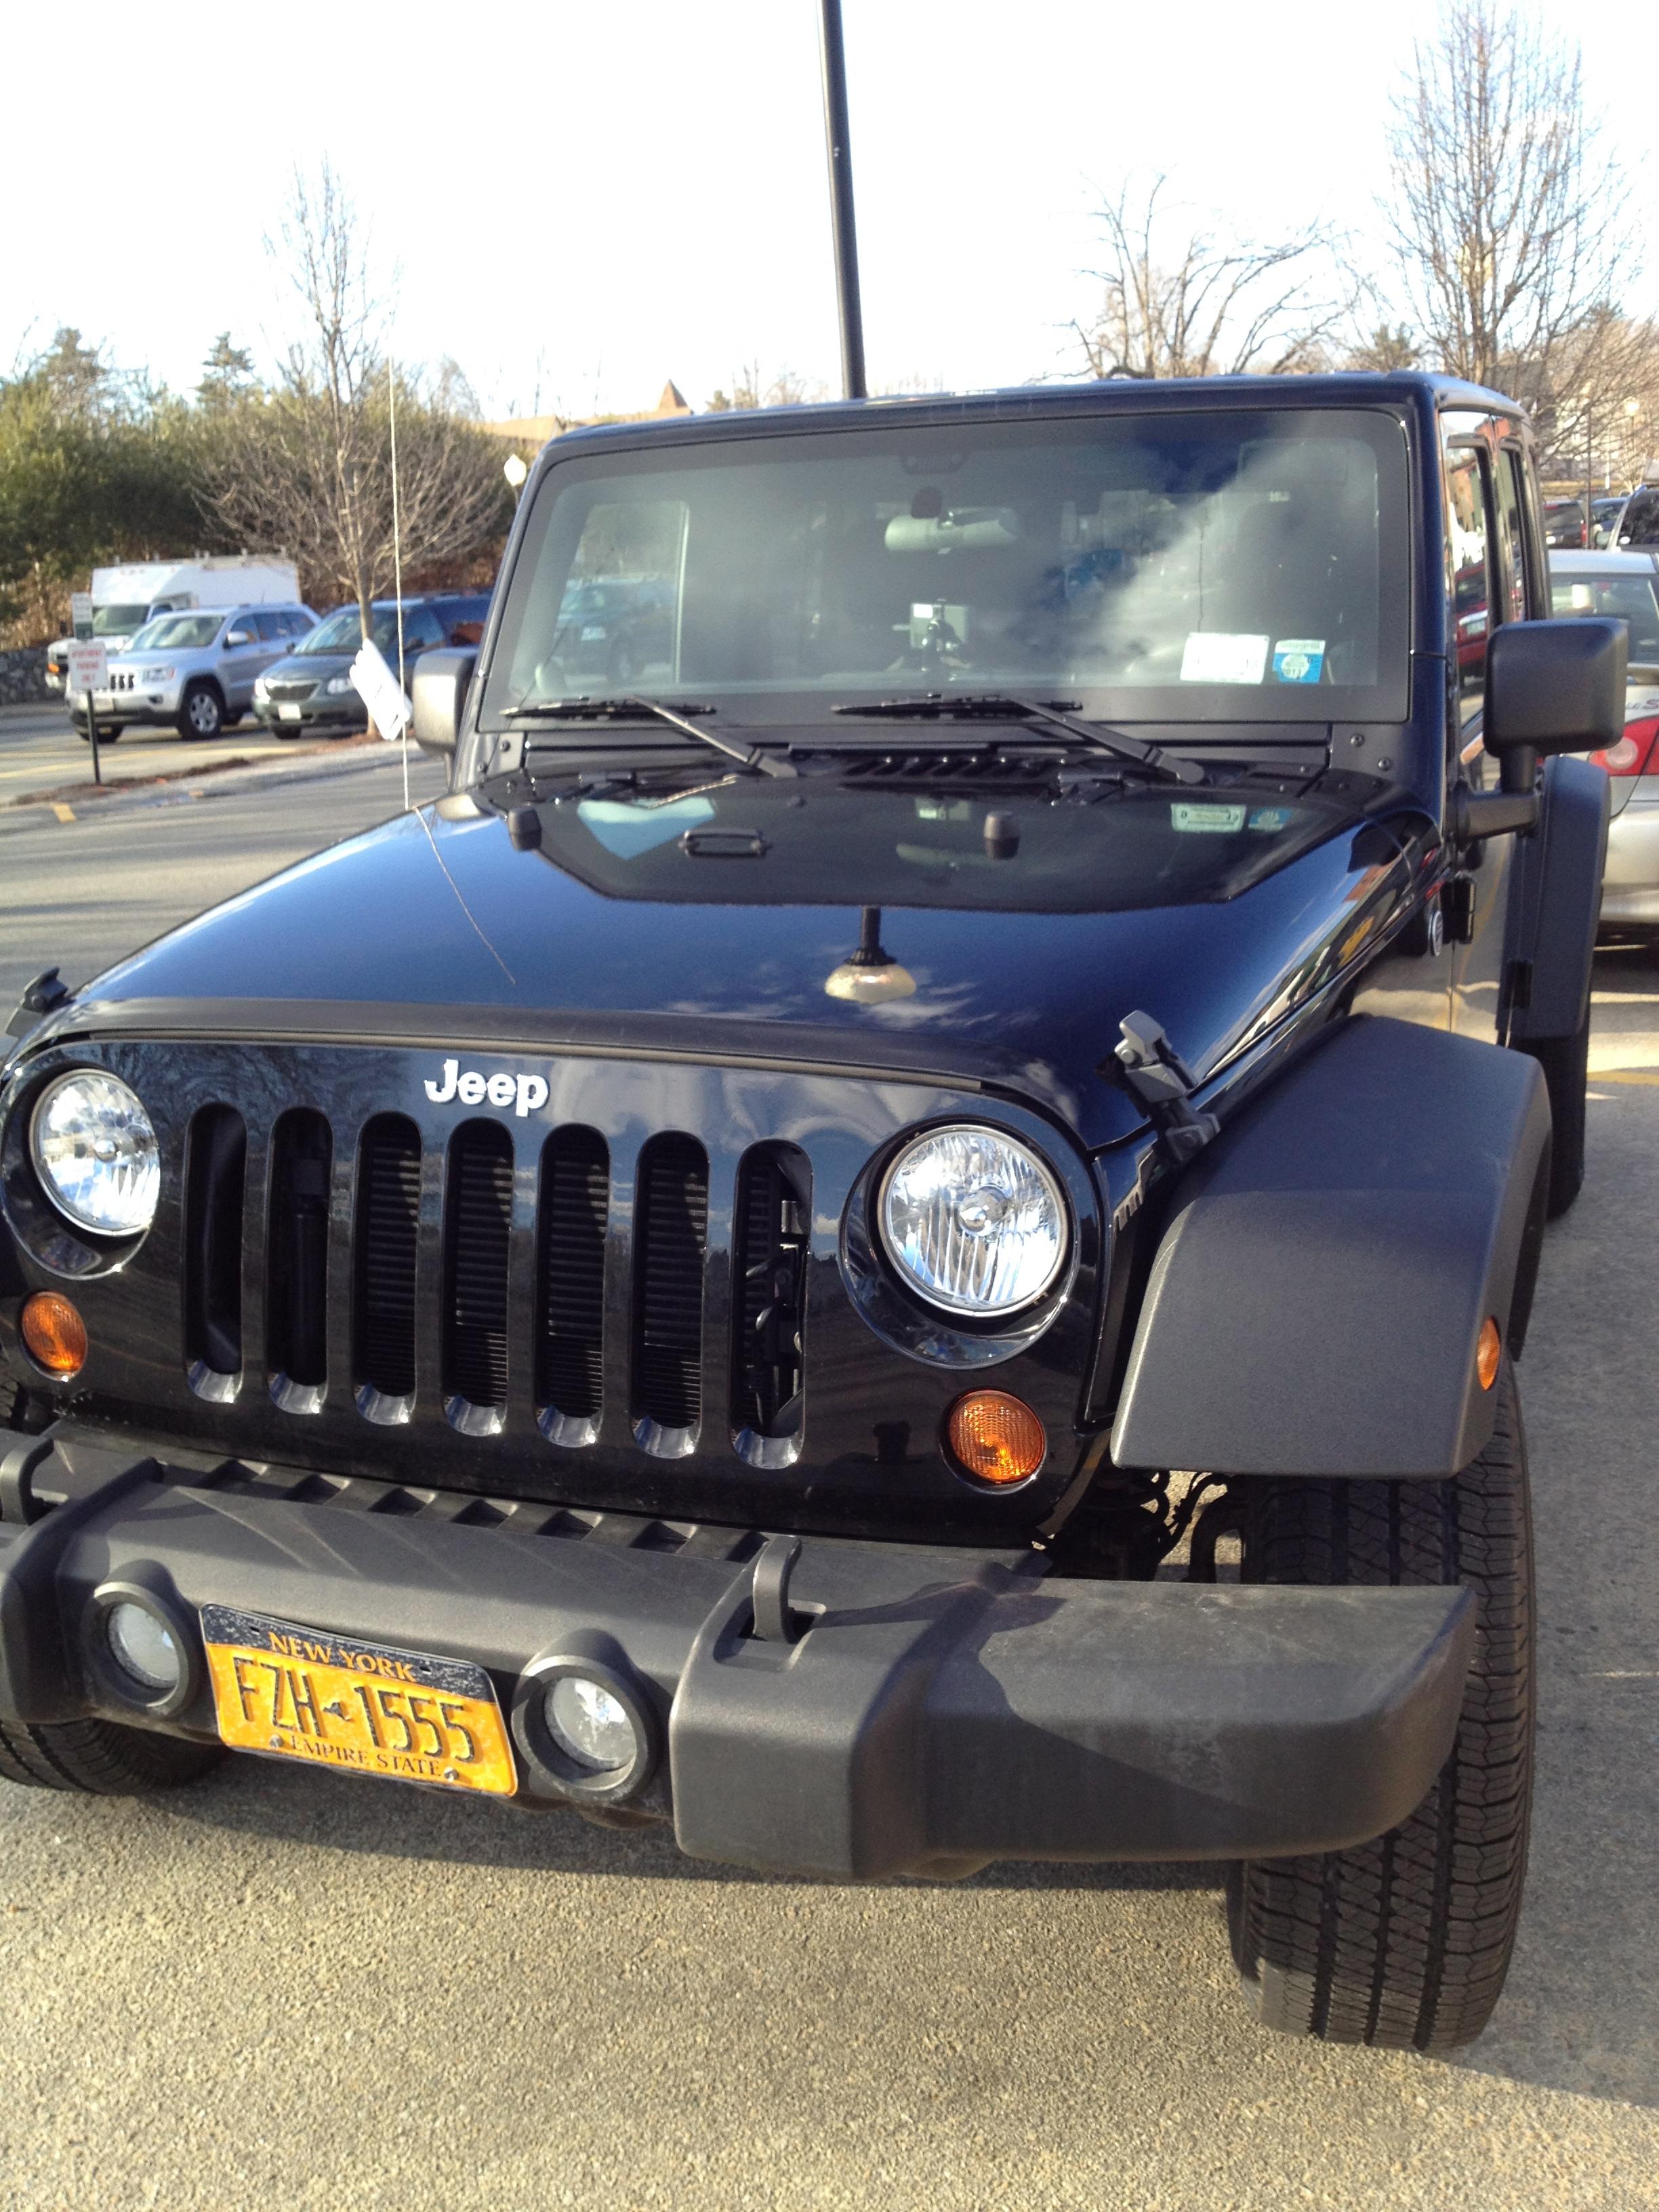 Payless Car Rental Boston Logan Intl Airport MA BOS